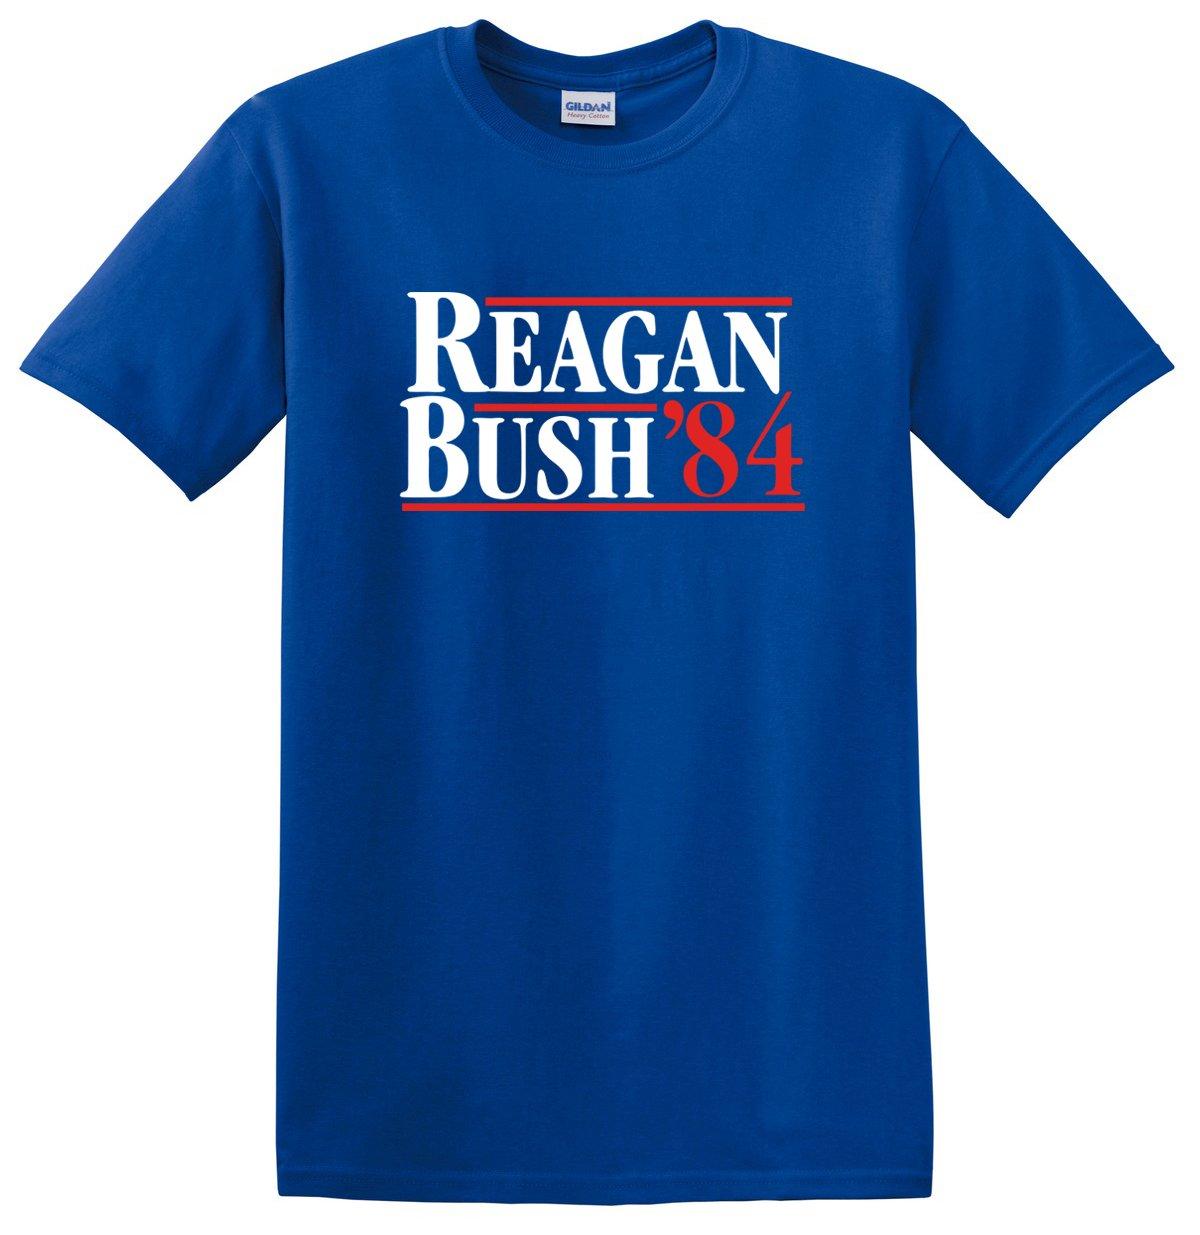 New York Fashion Police Reagan Bush 84 T Shirt Republican Presidential Election Campaign G